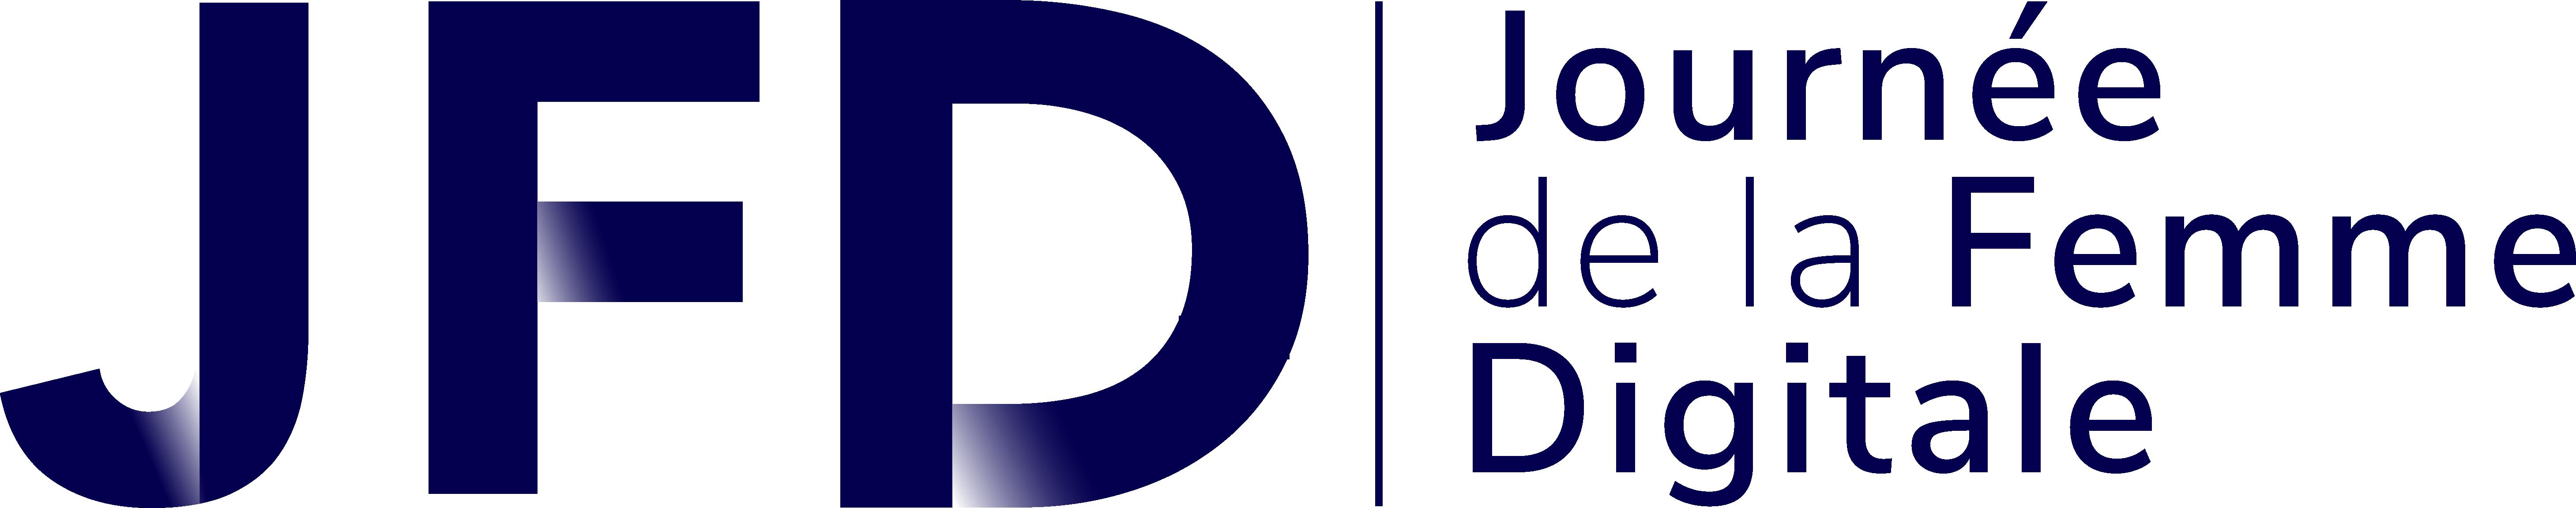 JFD-BASELINE-BLEU